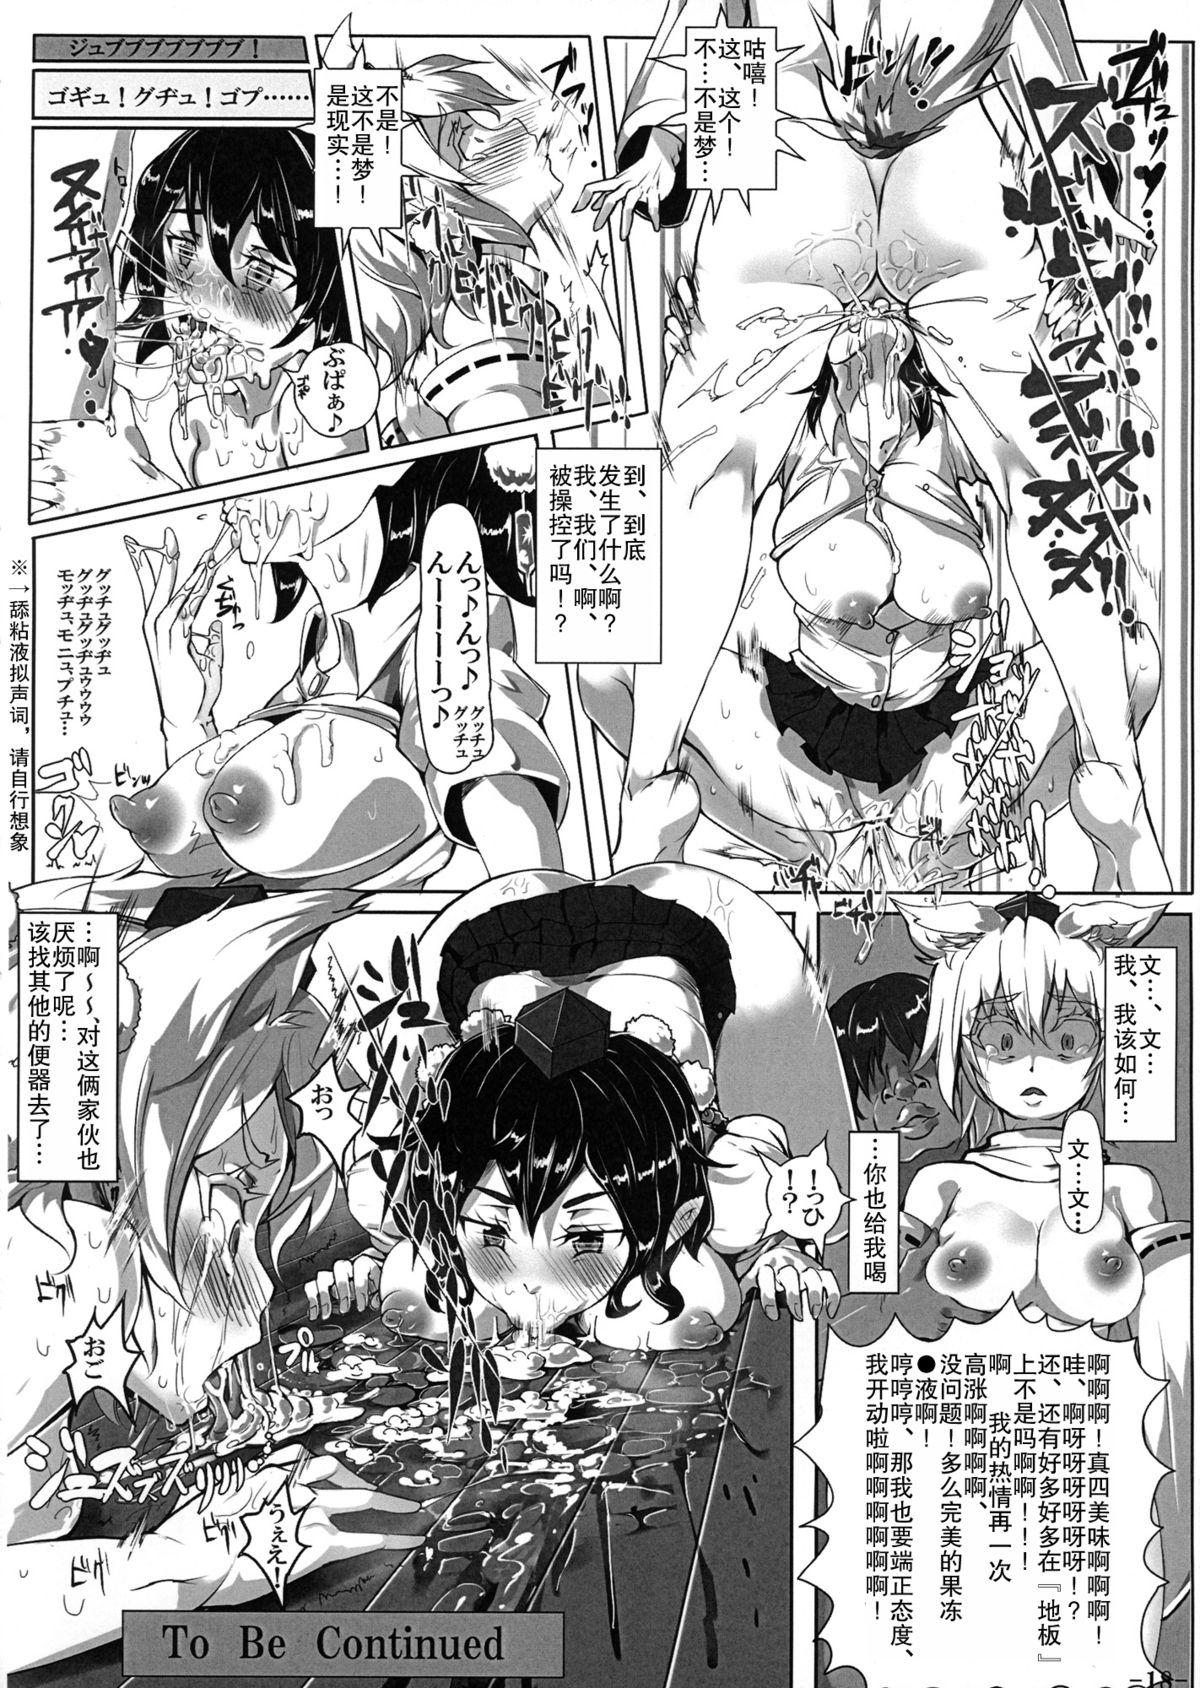 (Reitaisai 10) [Nyuu Koubou (Nyuu)] Saimin Nante Kakaranai!!! (Touhou Project)) [Chinese] [后悔的神官个人汉化] 19